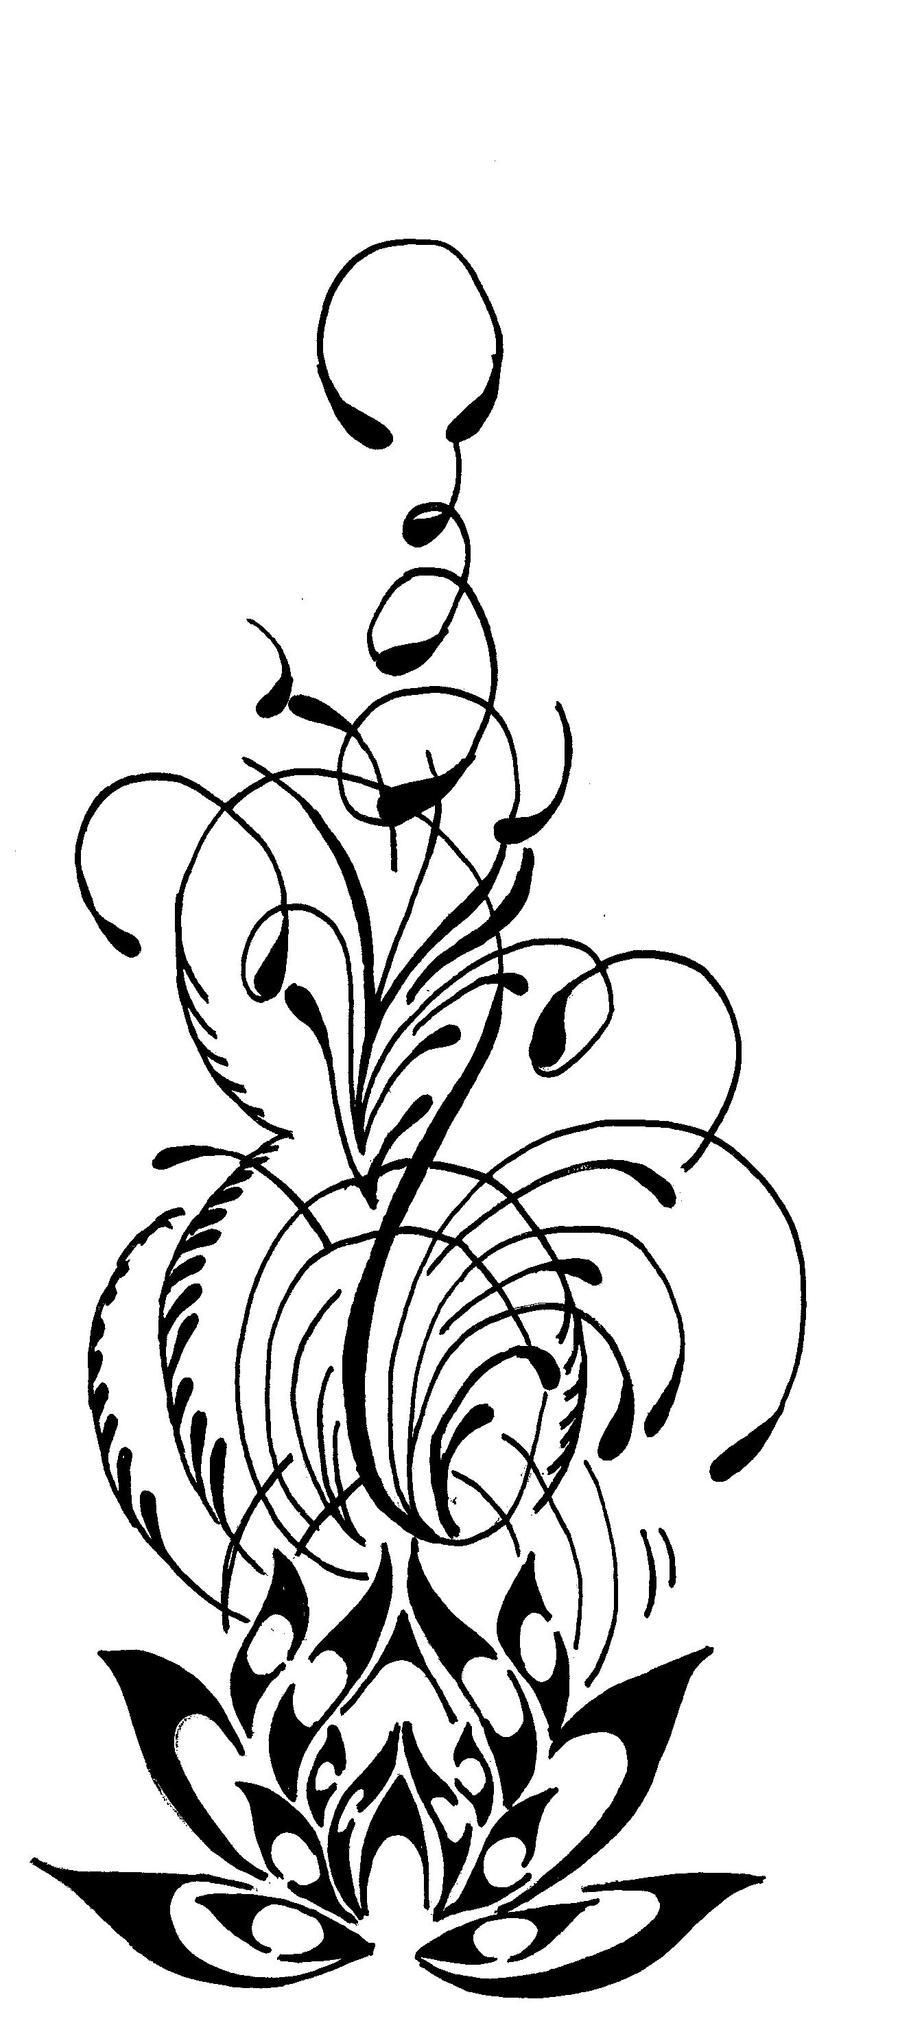 Fire lotus by nimrod tiger on deviantart fire lotus by nimrod tiger izmirmasajfo